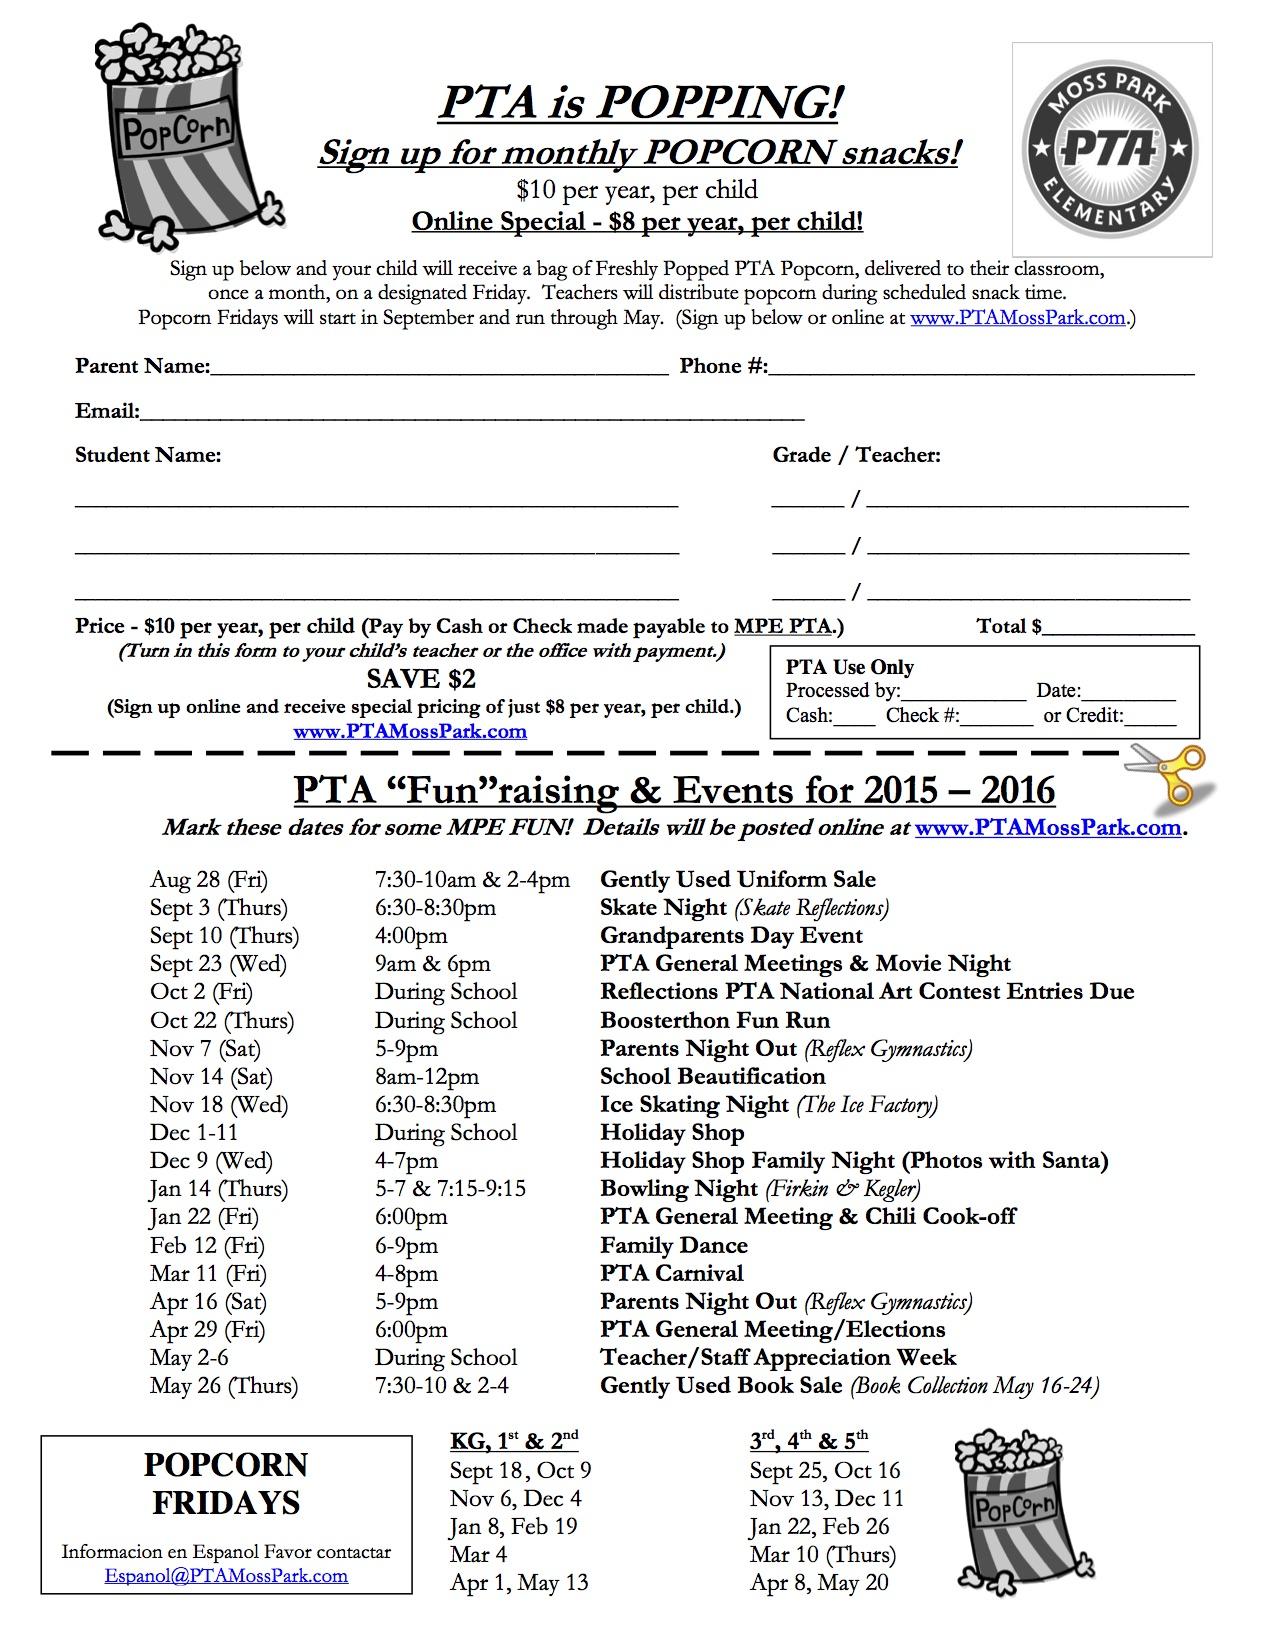 2015-2016 Popcorn Sign Up